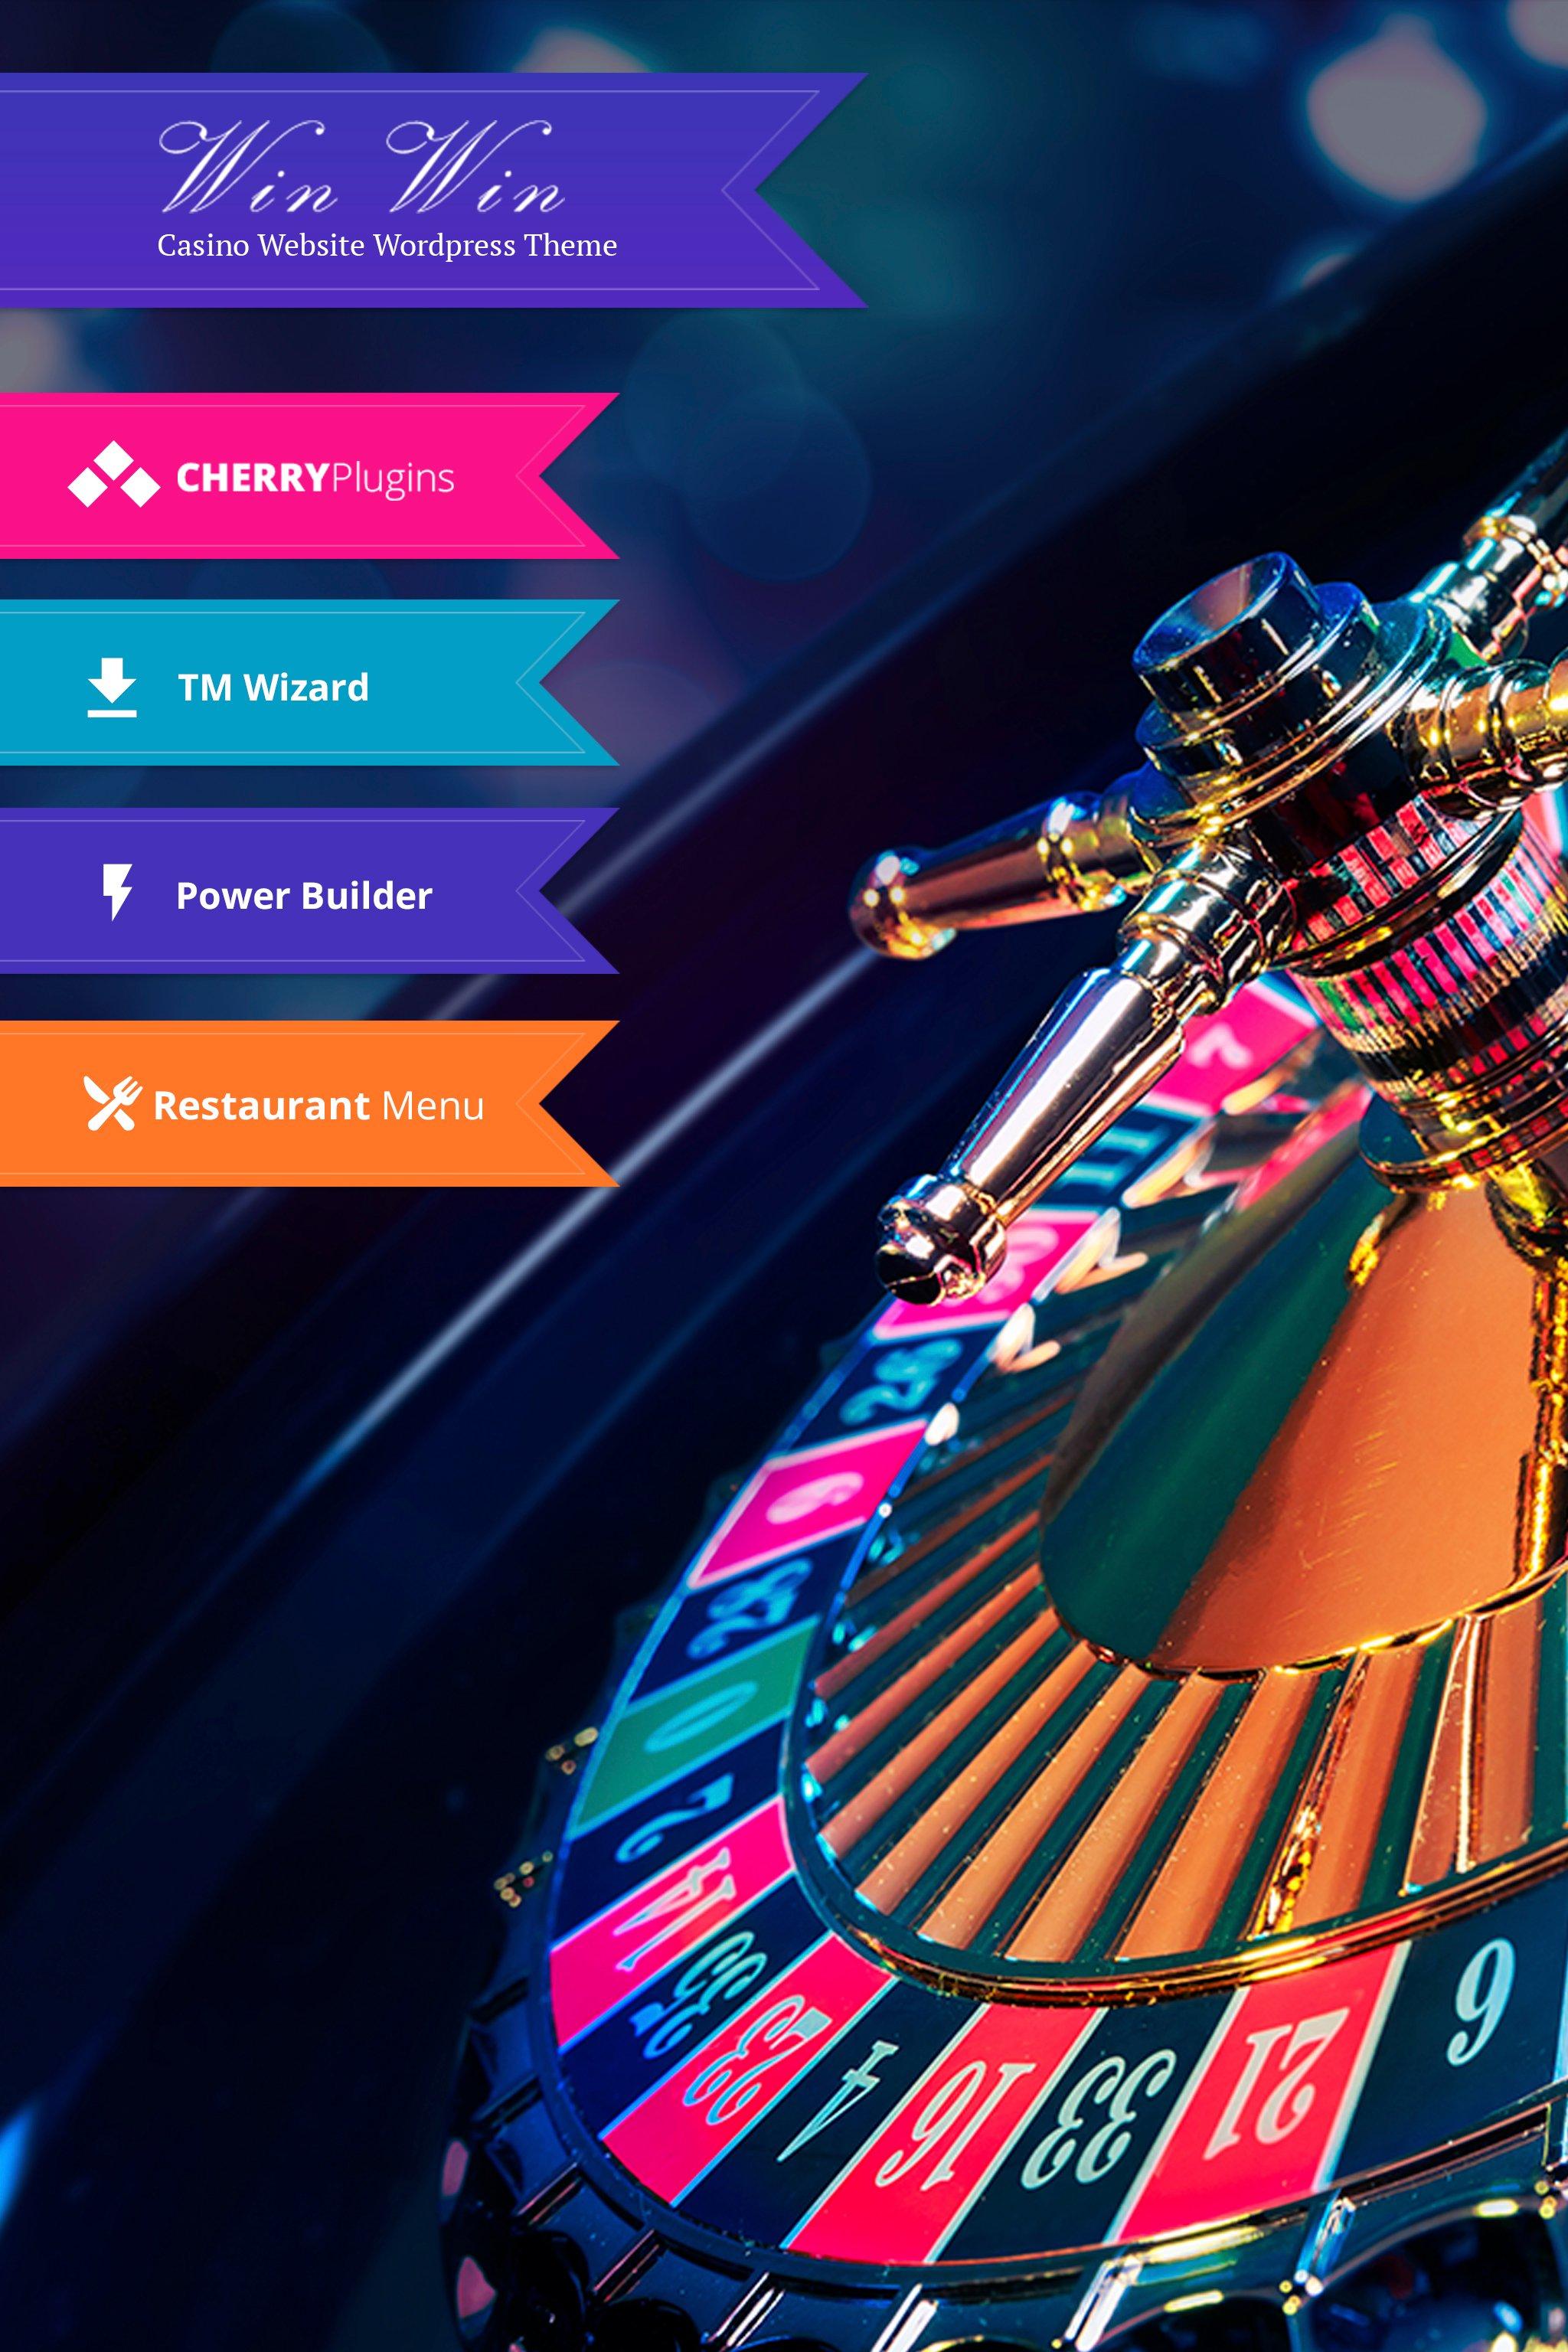 """WinWin - Casino Website WordPress Theme"" 响应式WordPress模板 #64702 - 截图"